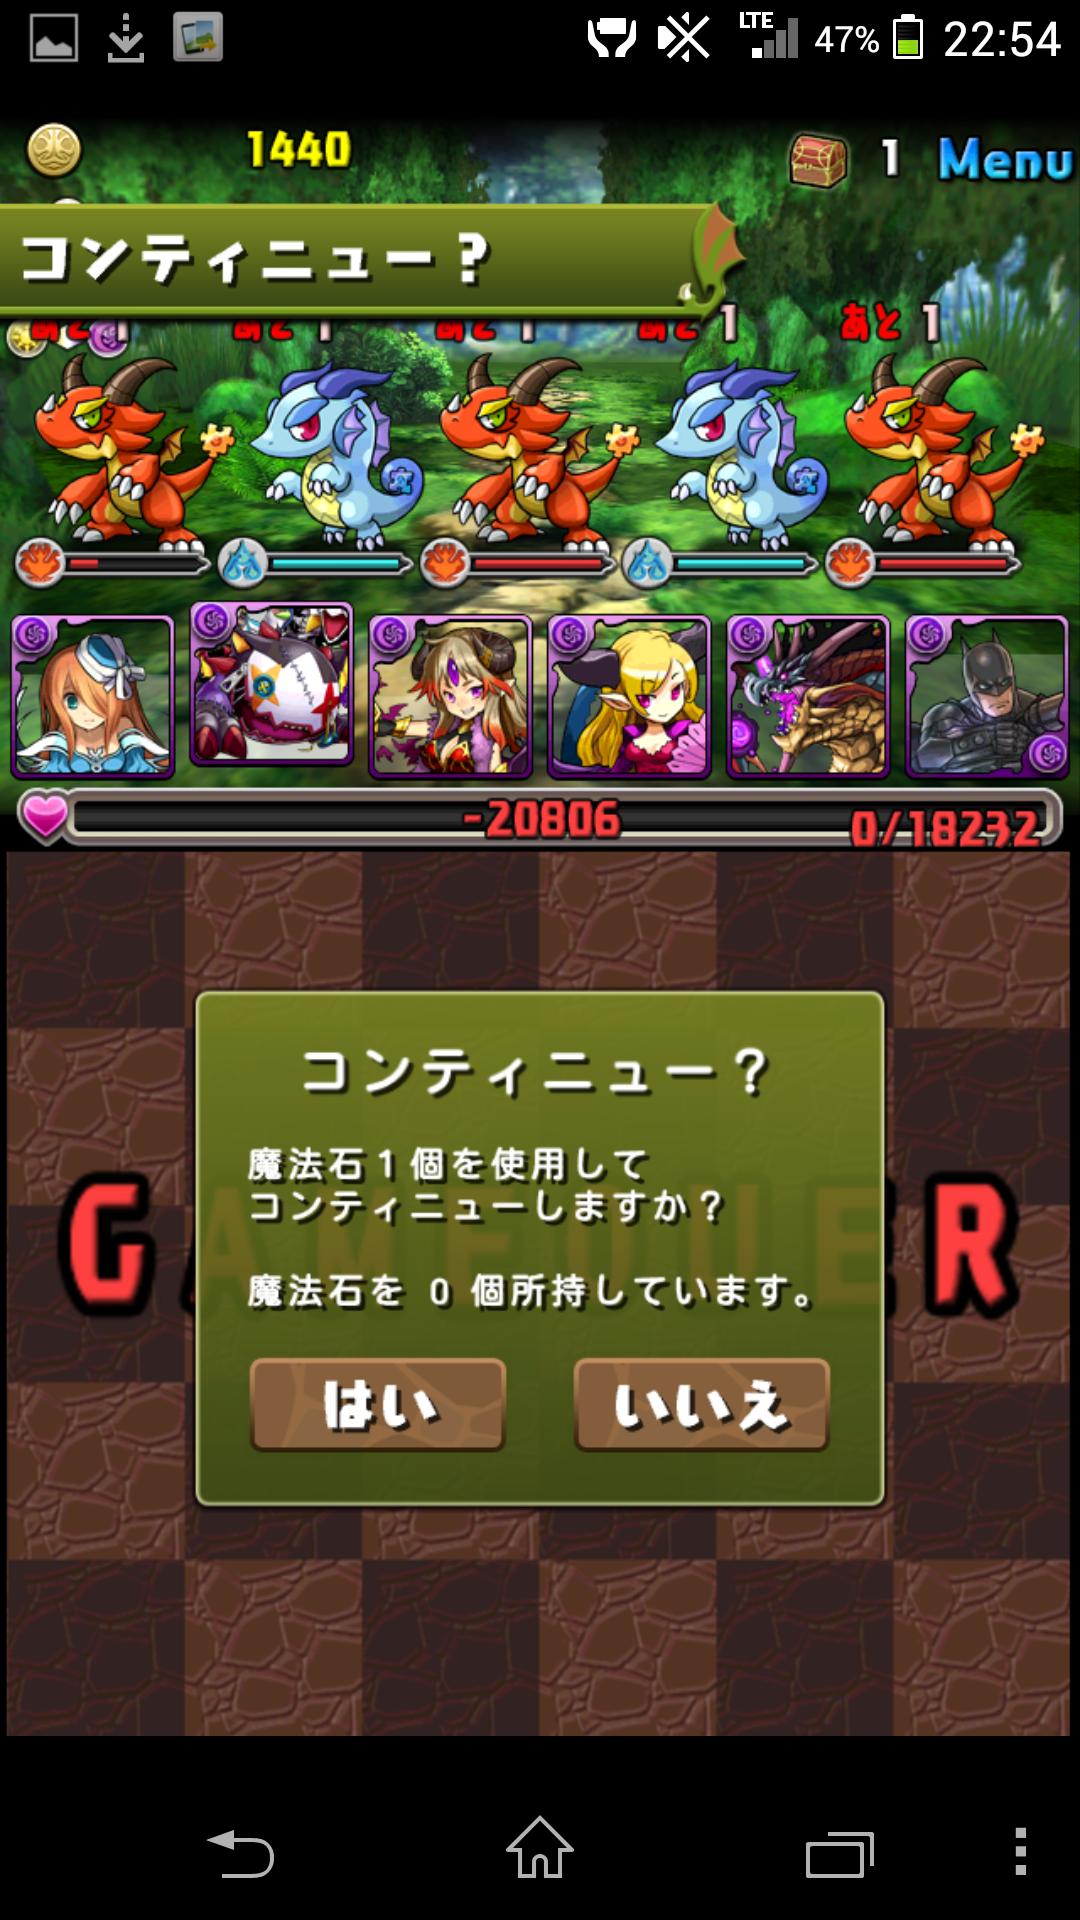 Screenshot_2014-04-15-22-54-28.png